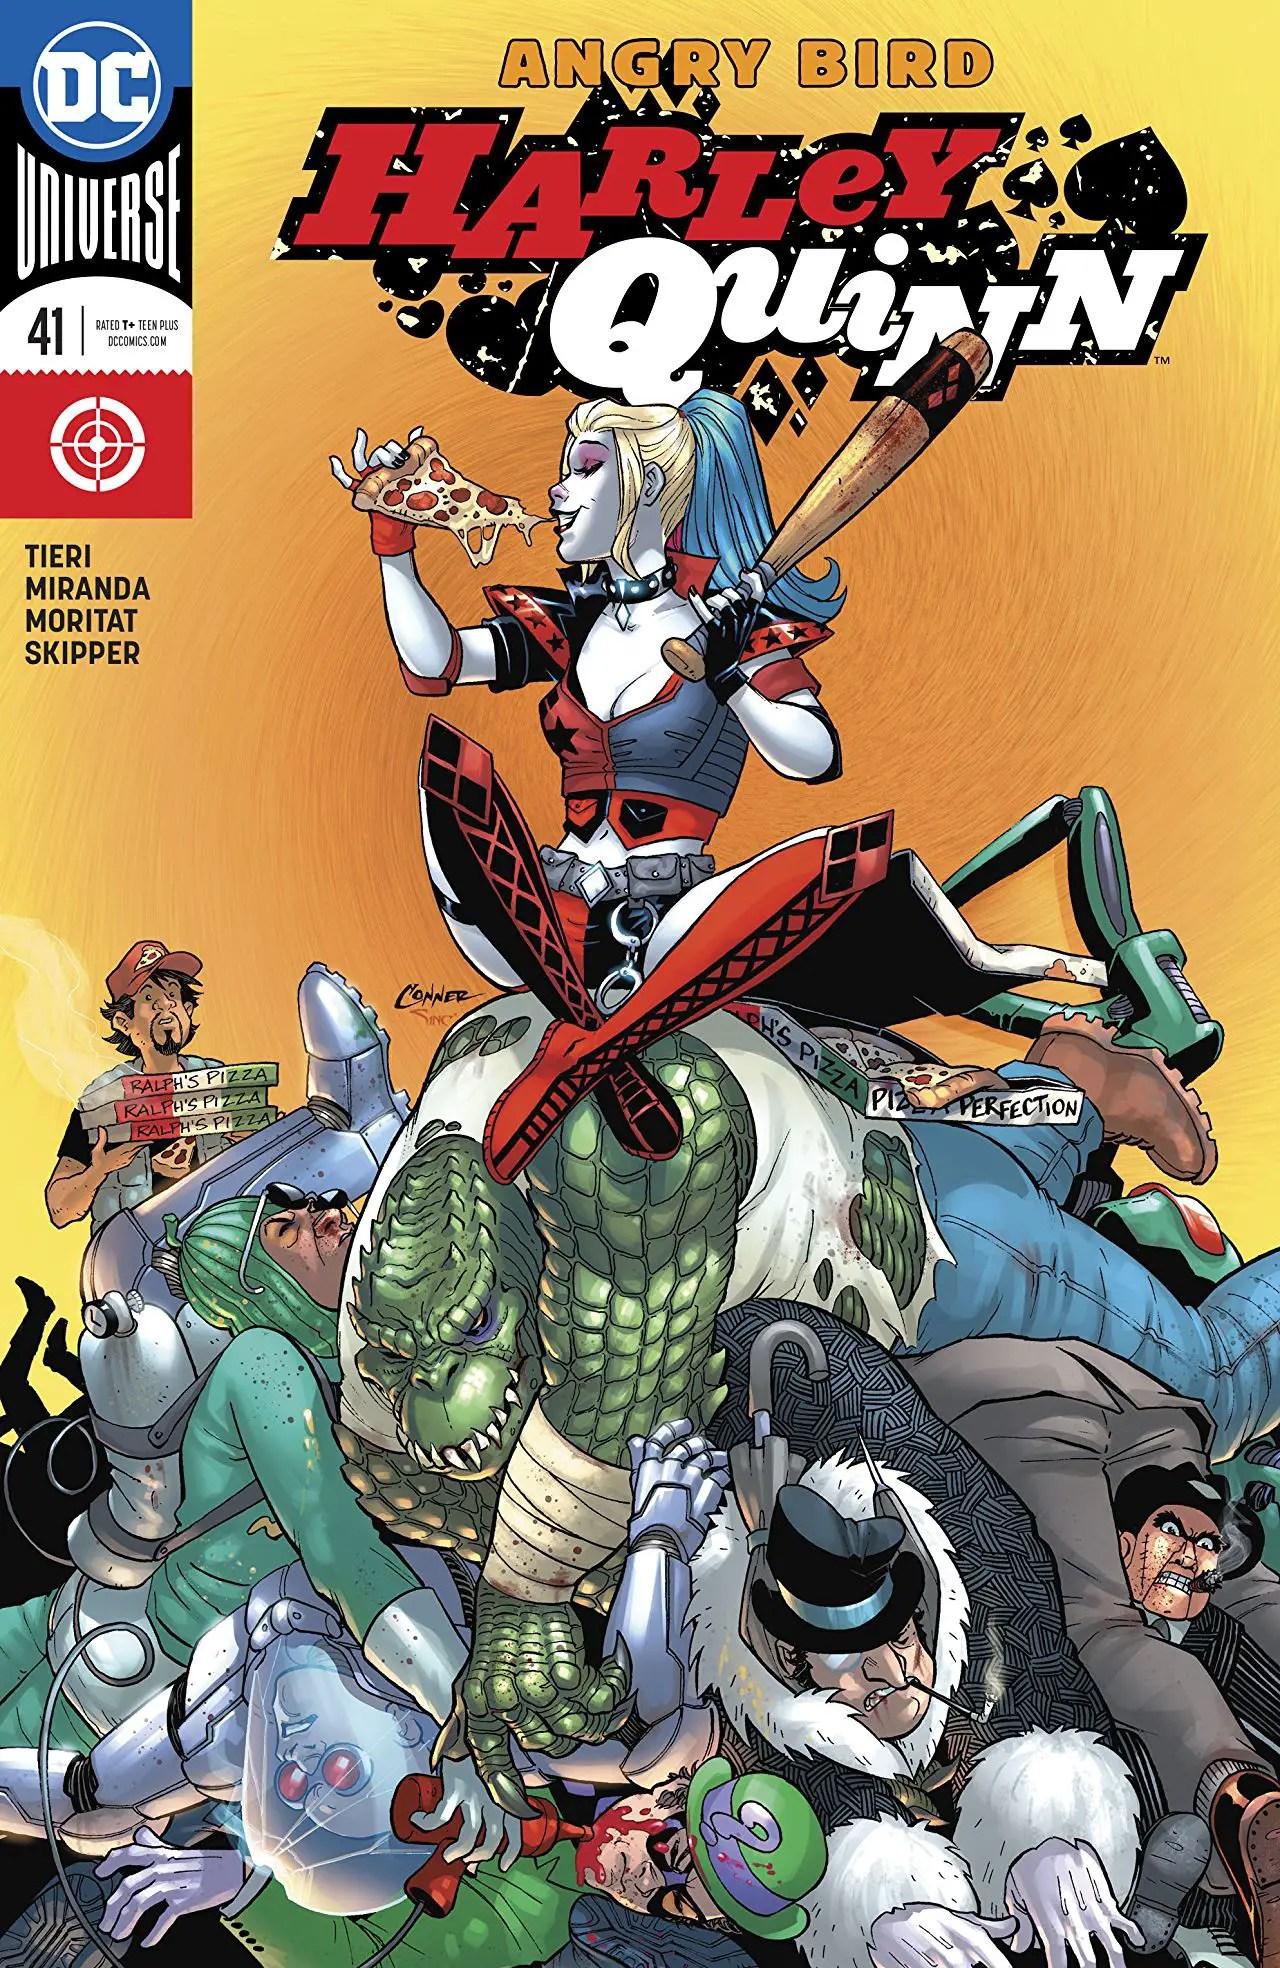 Harley Quinn #41 Review